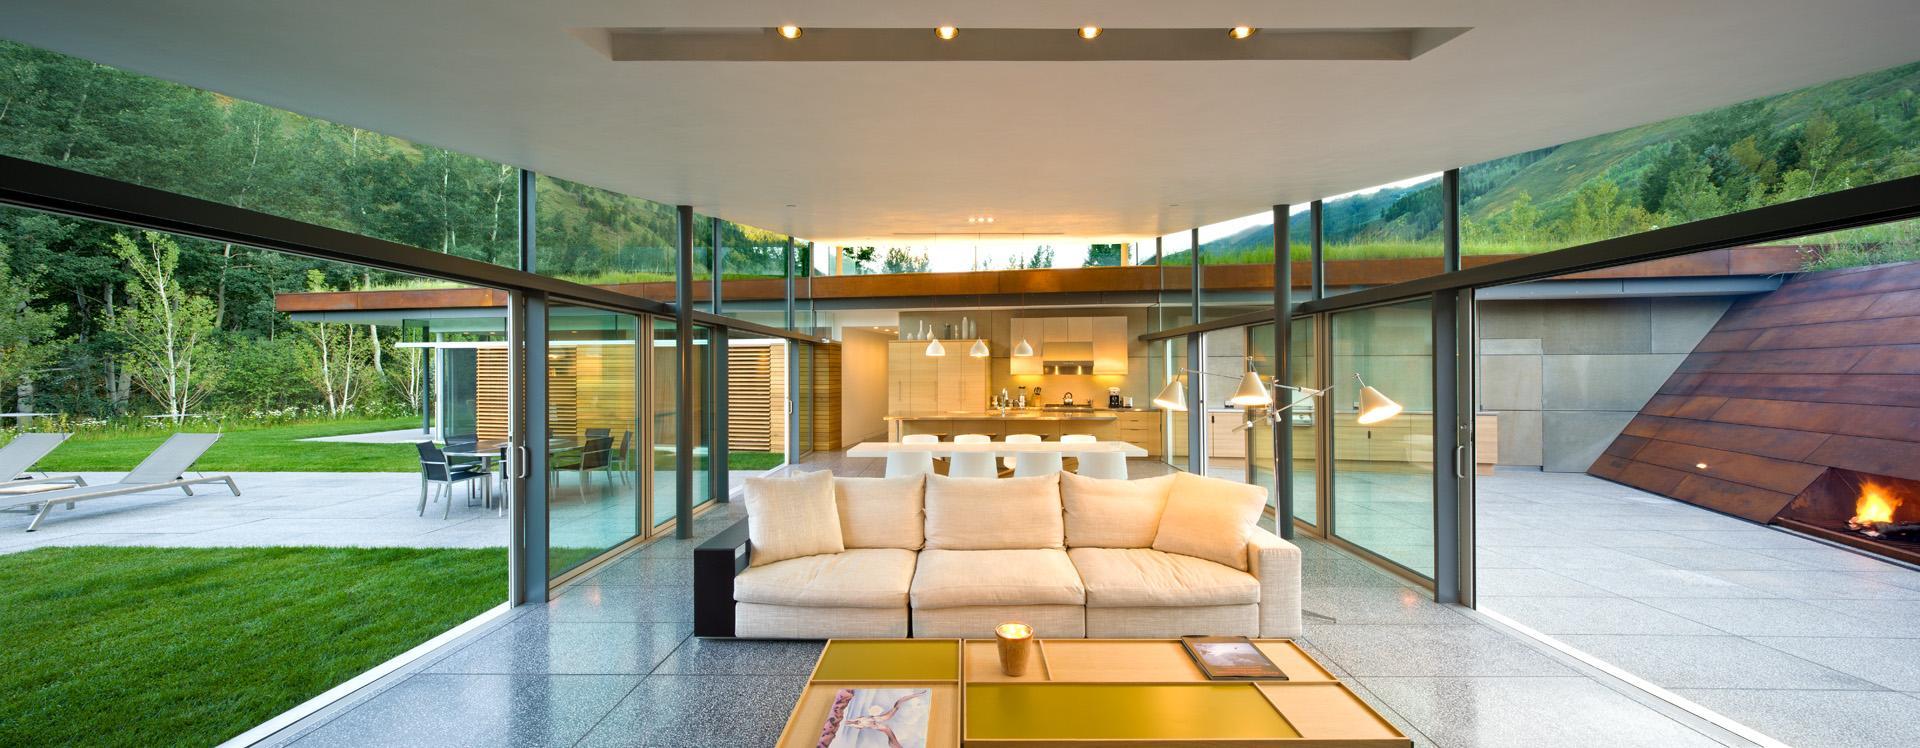 Modern Design Inspiration: 5 Outdoor Fireplaces